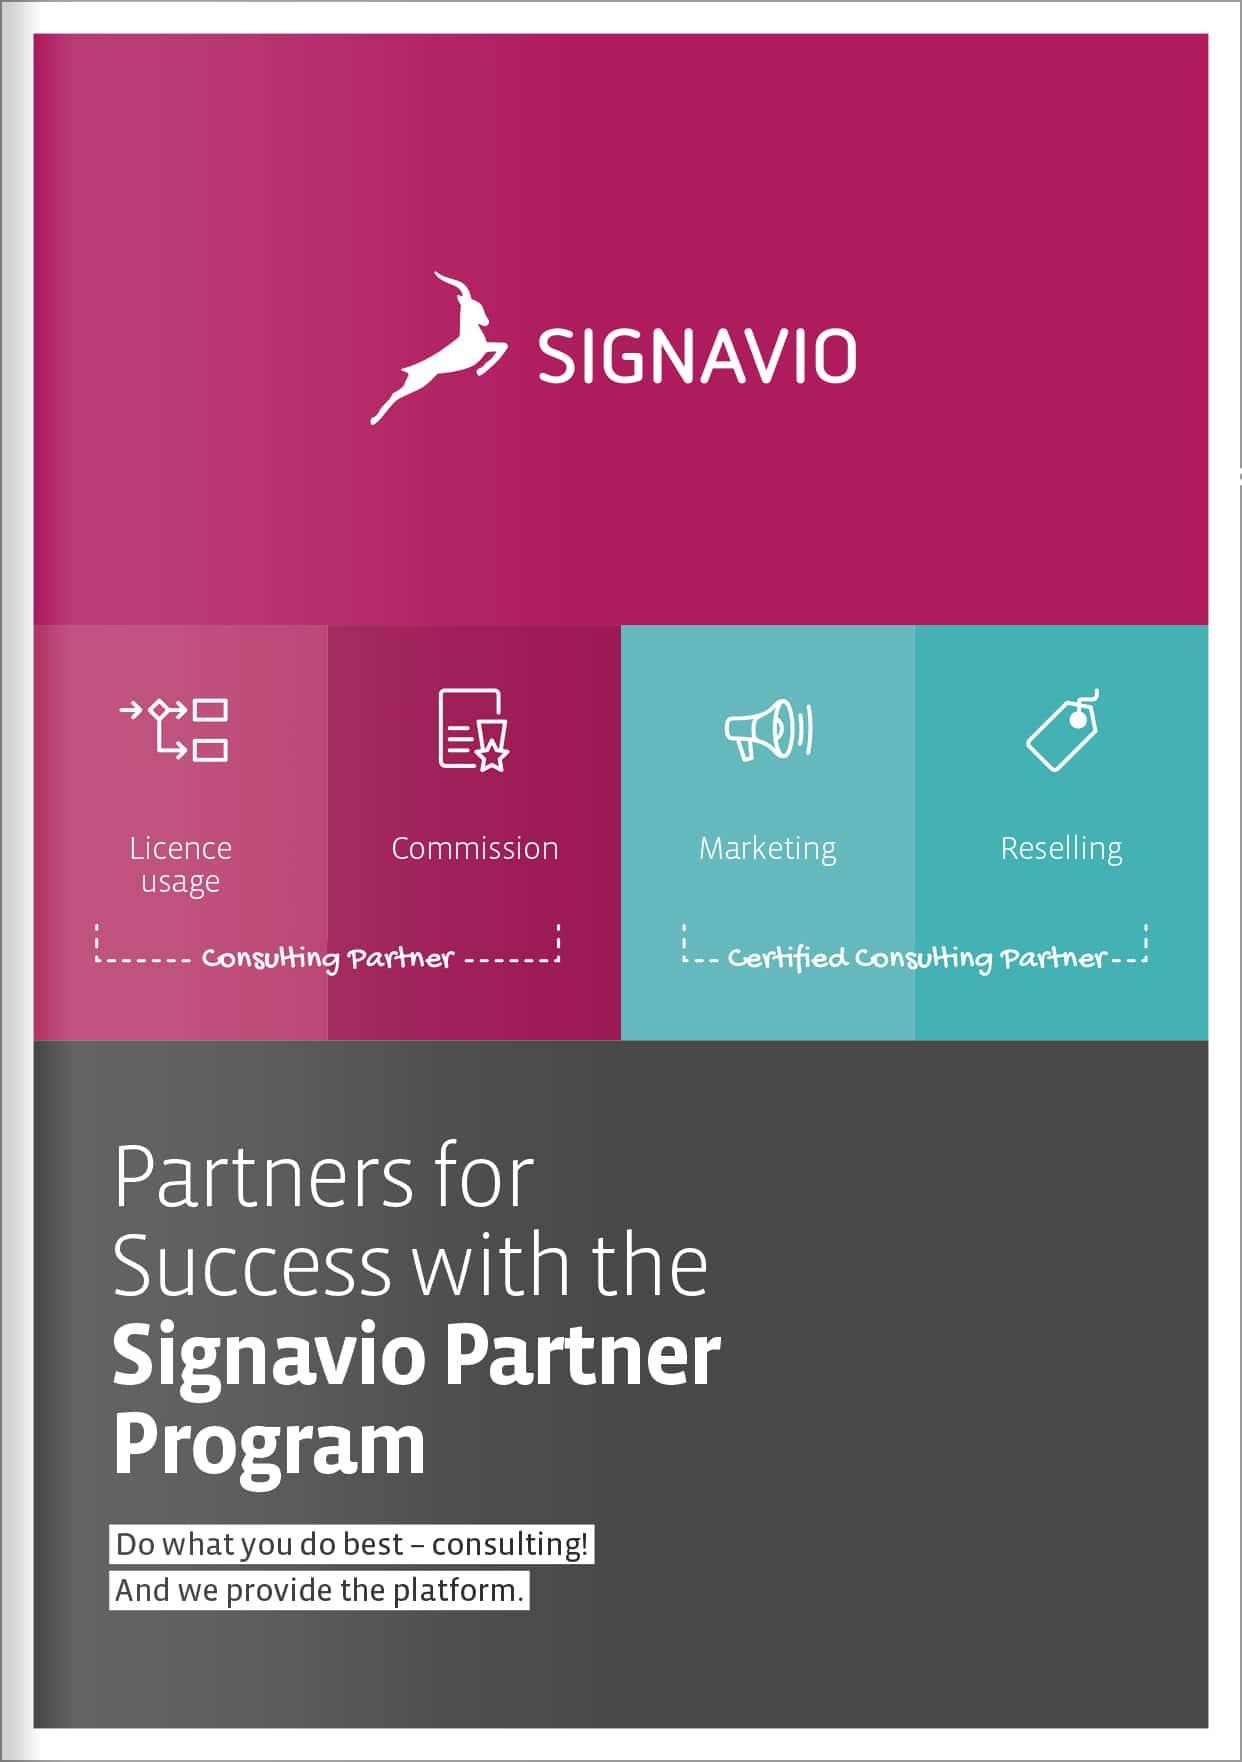 signavio-partner-program-cover